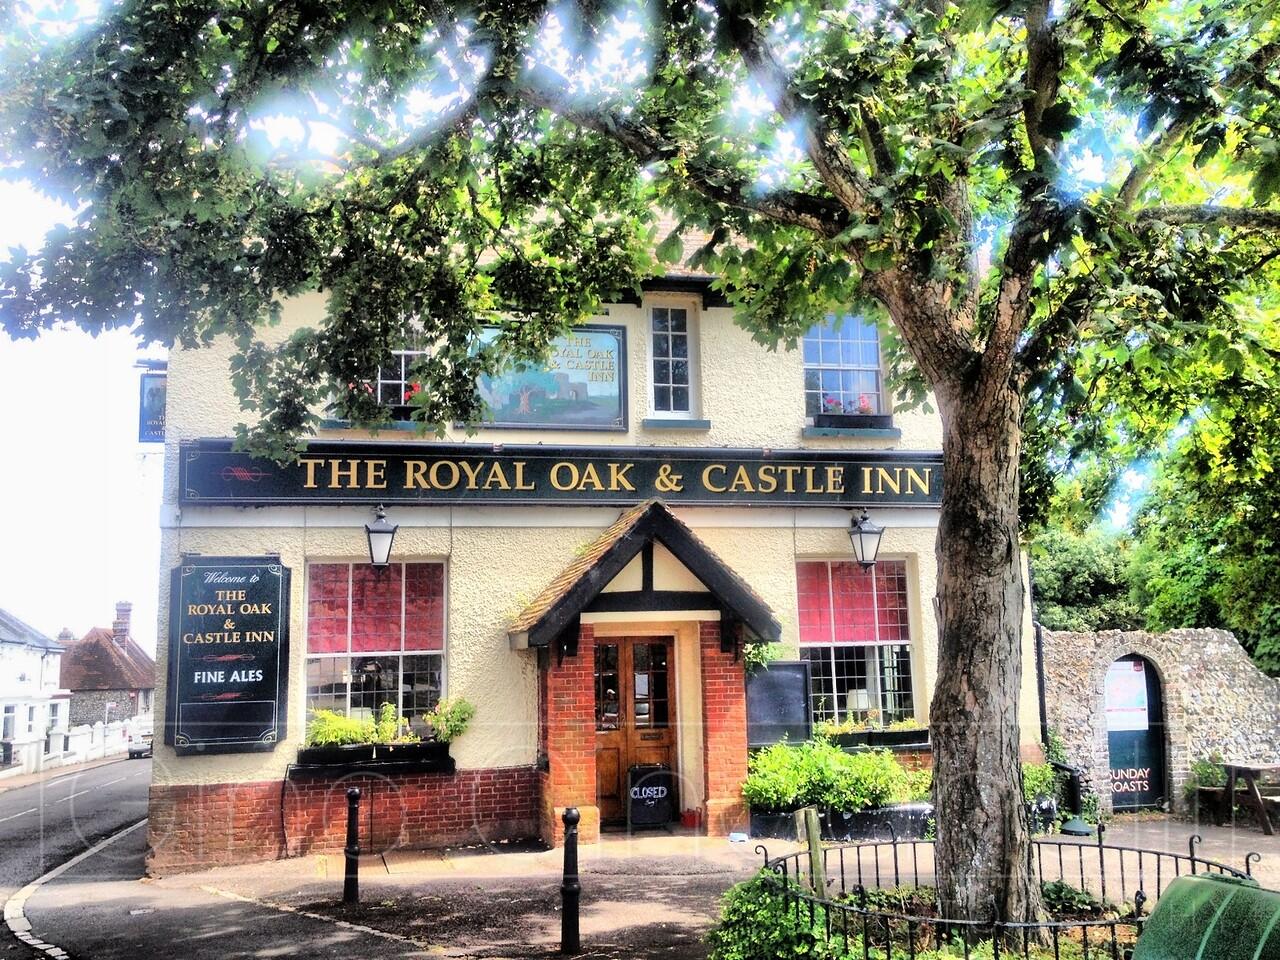 The Royal Oak and Castle Inn